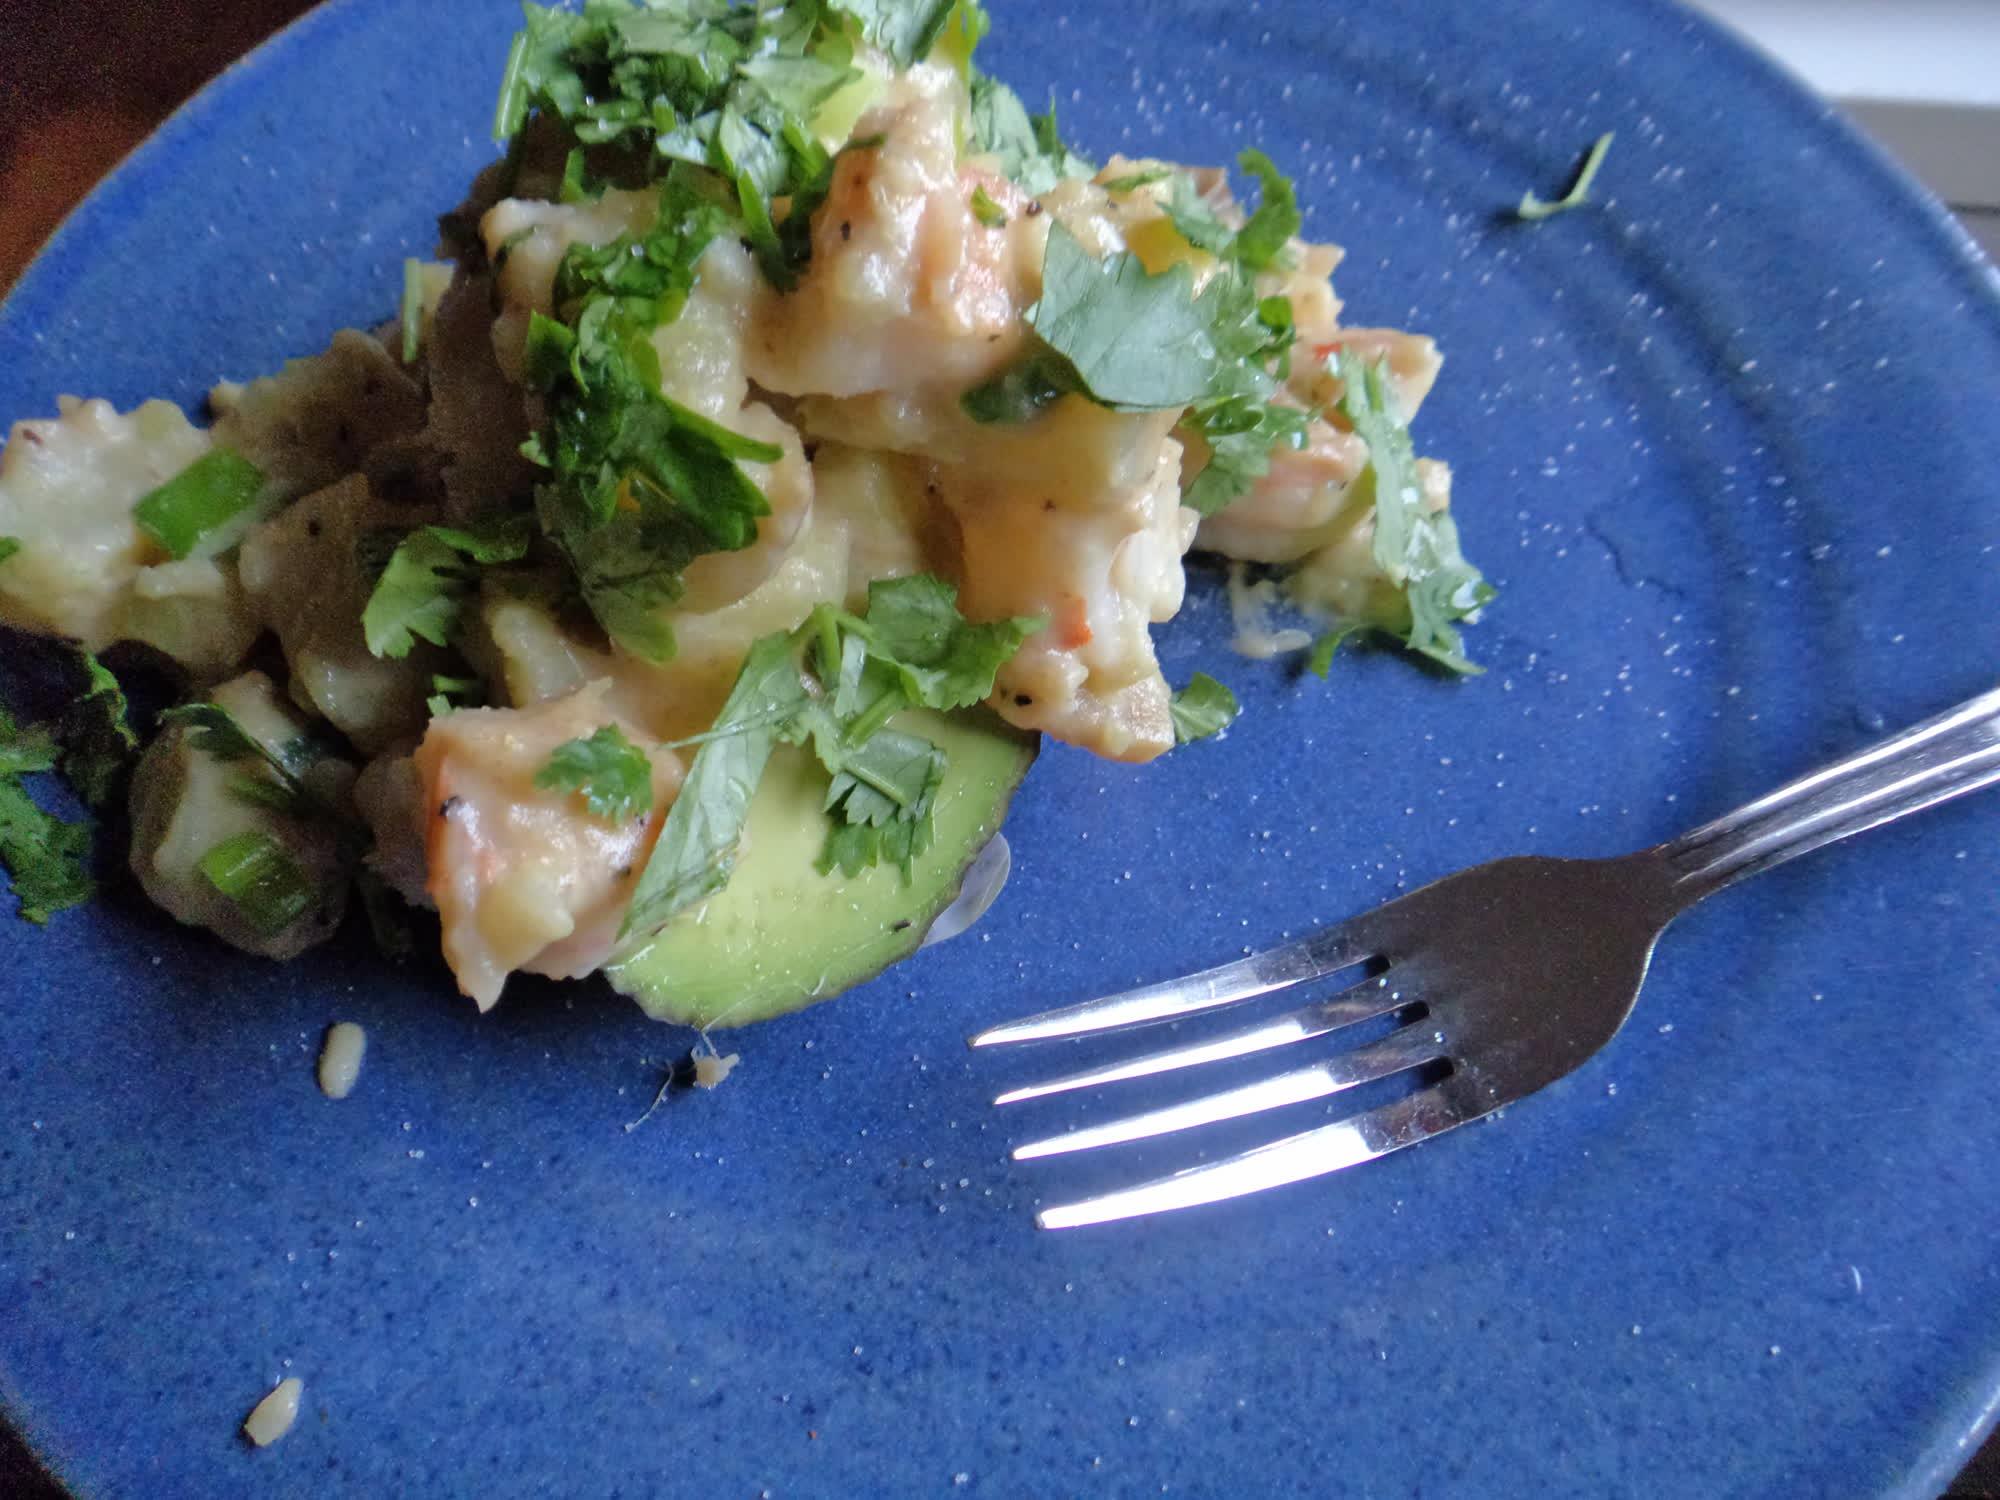 Shrimp salad on avocado.